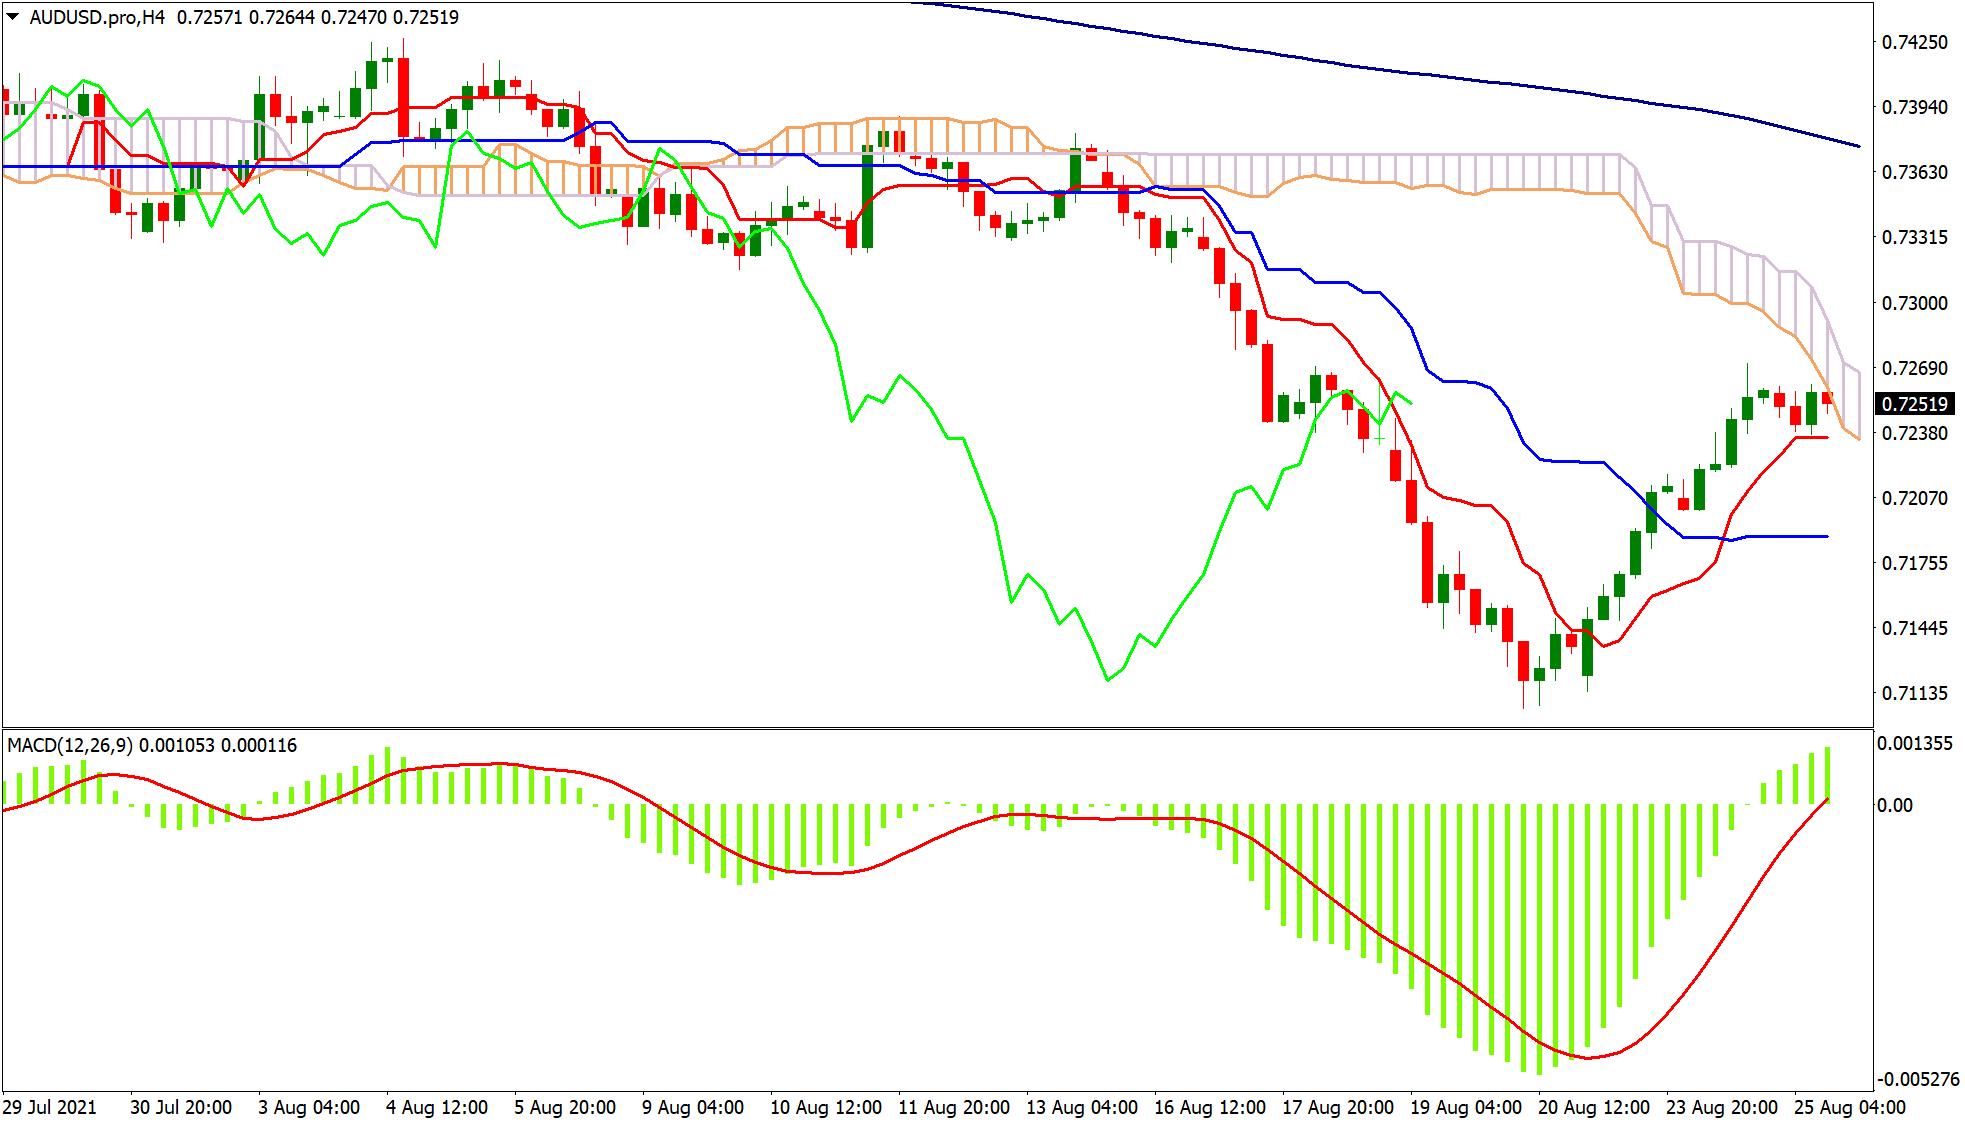 Using MACD and Ichimoku Cloud together on trading chart